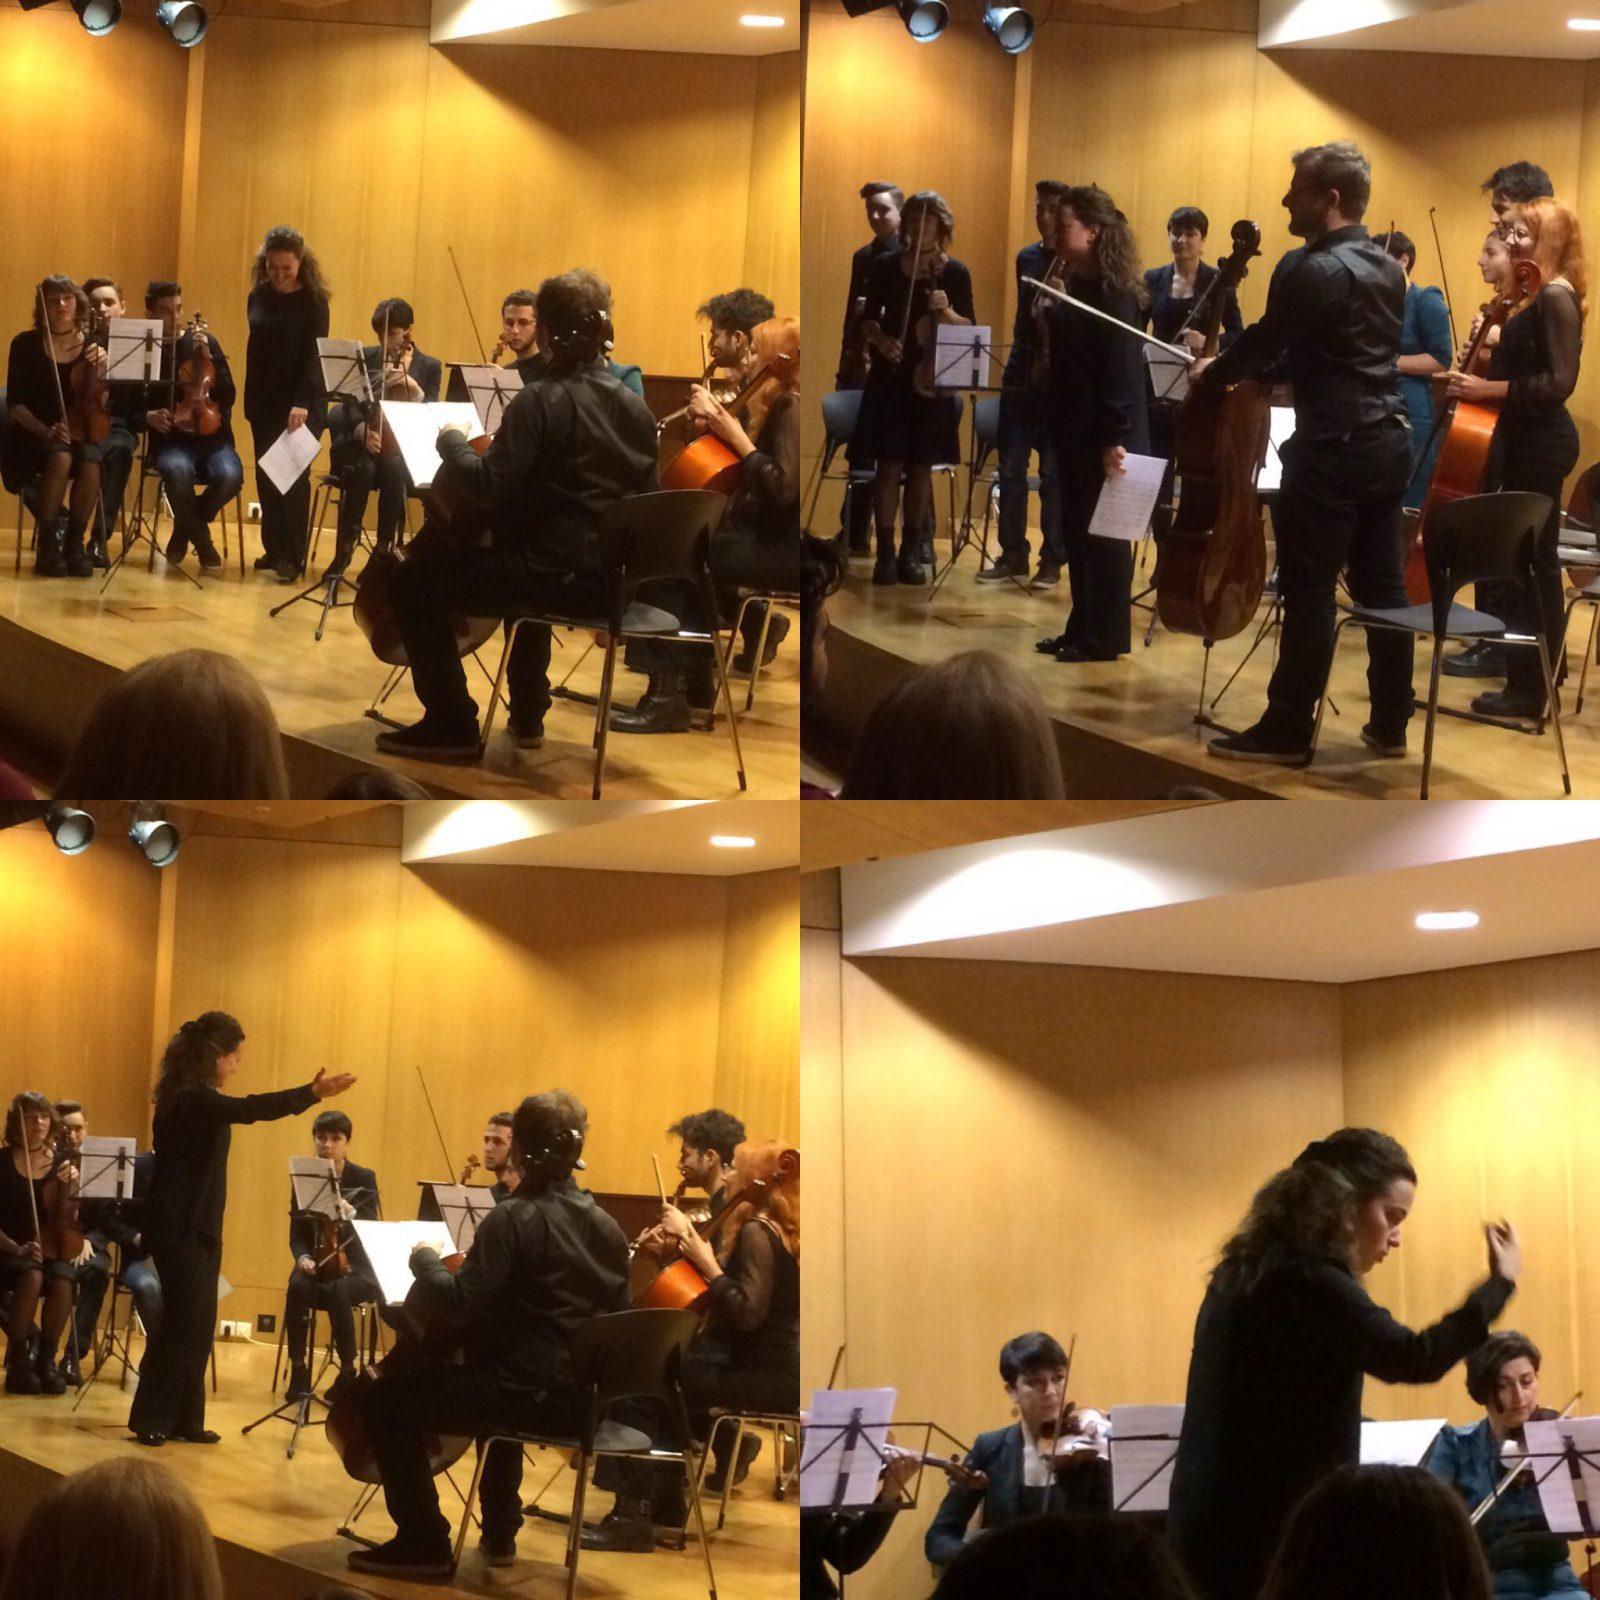 Concert in Megaron Athens Concert Hall